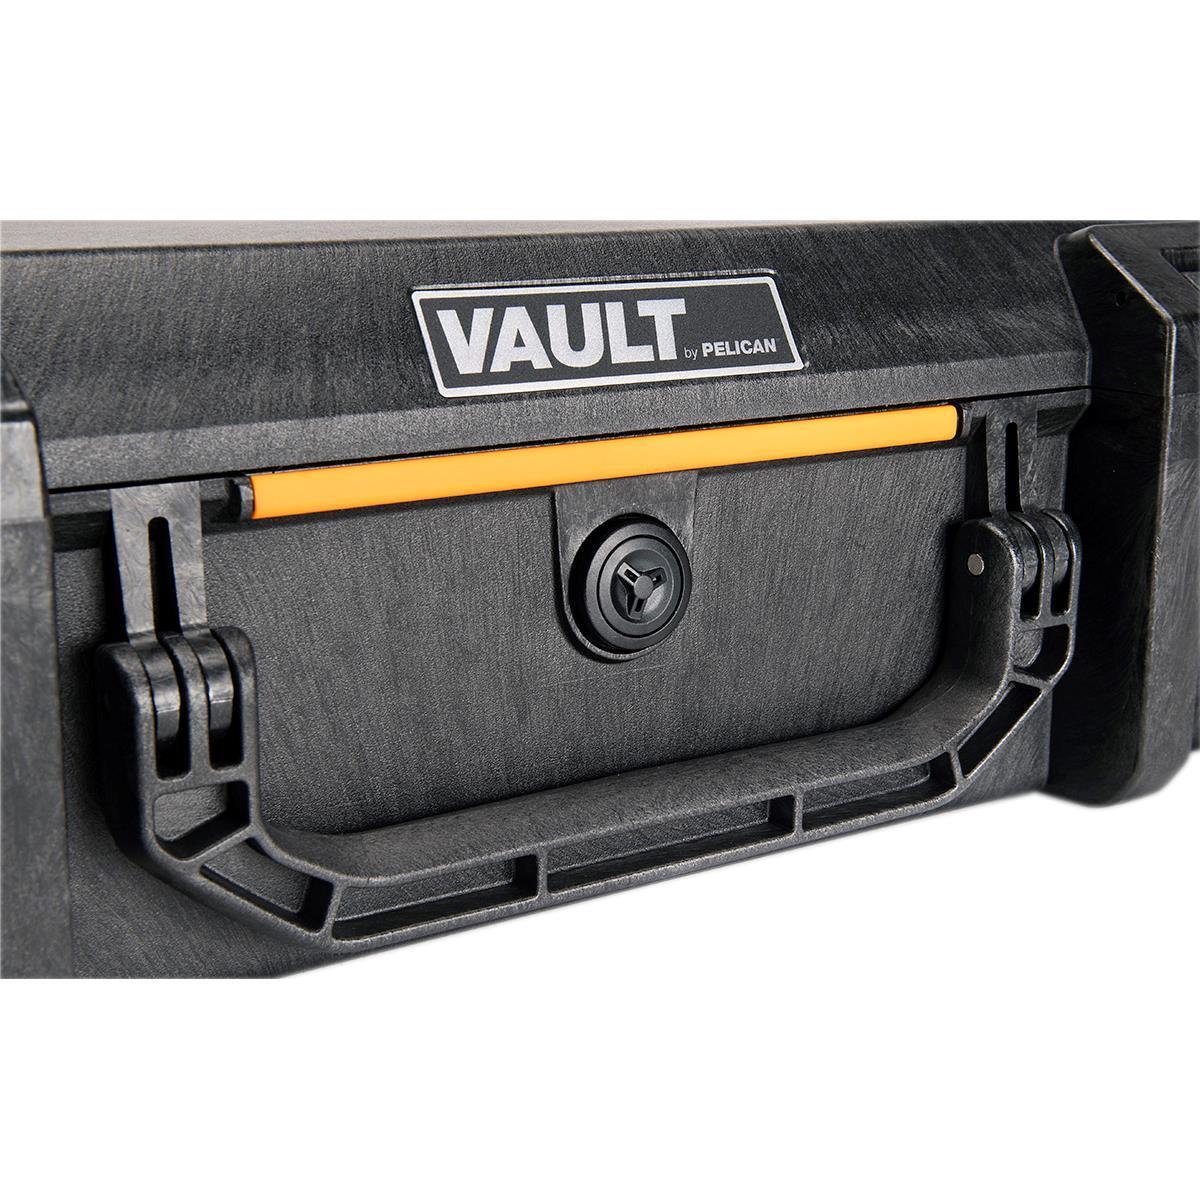 0009512_pelican-vault-v800-double-rifle-case